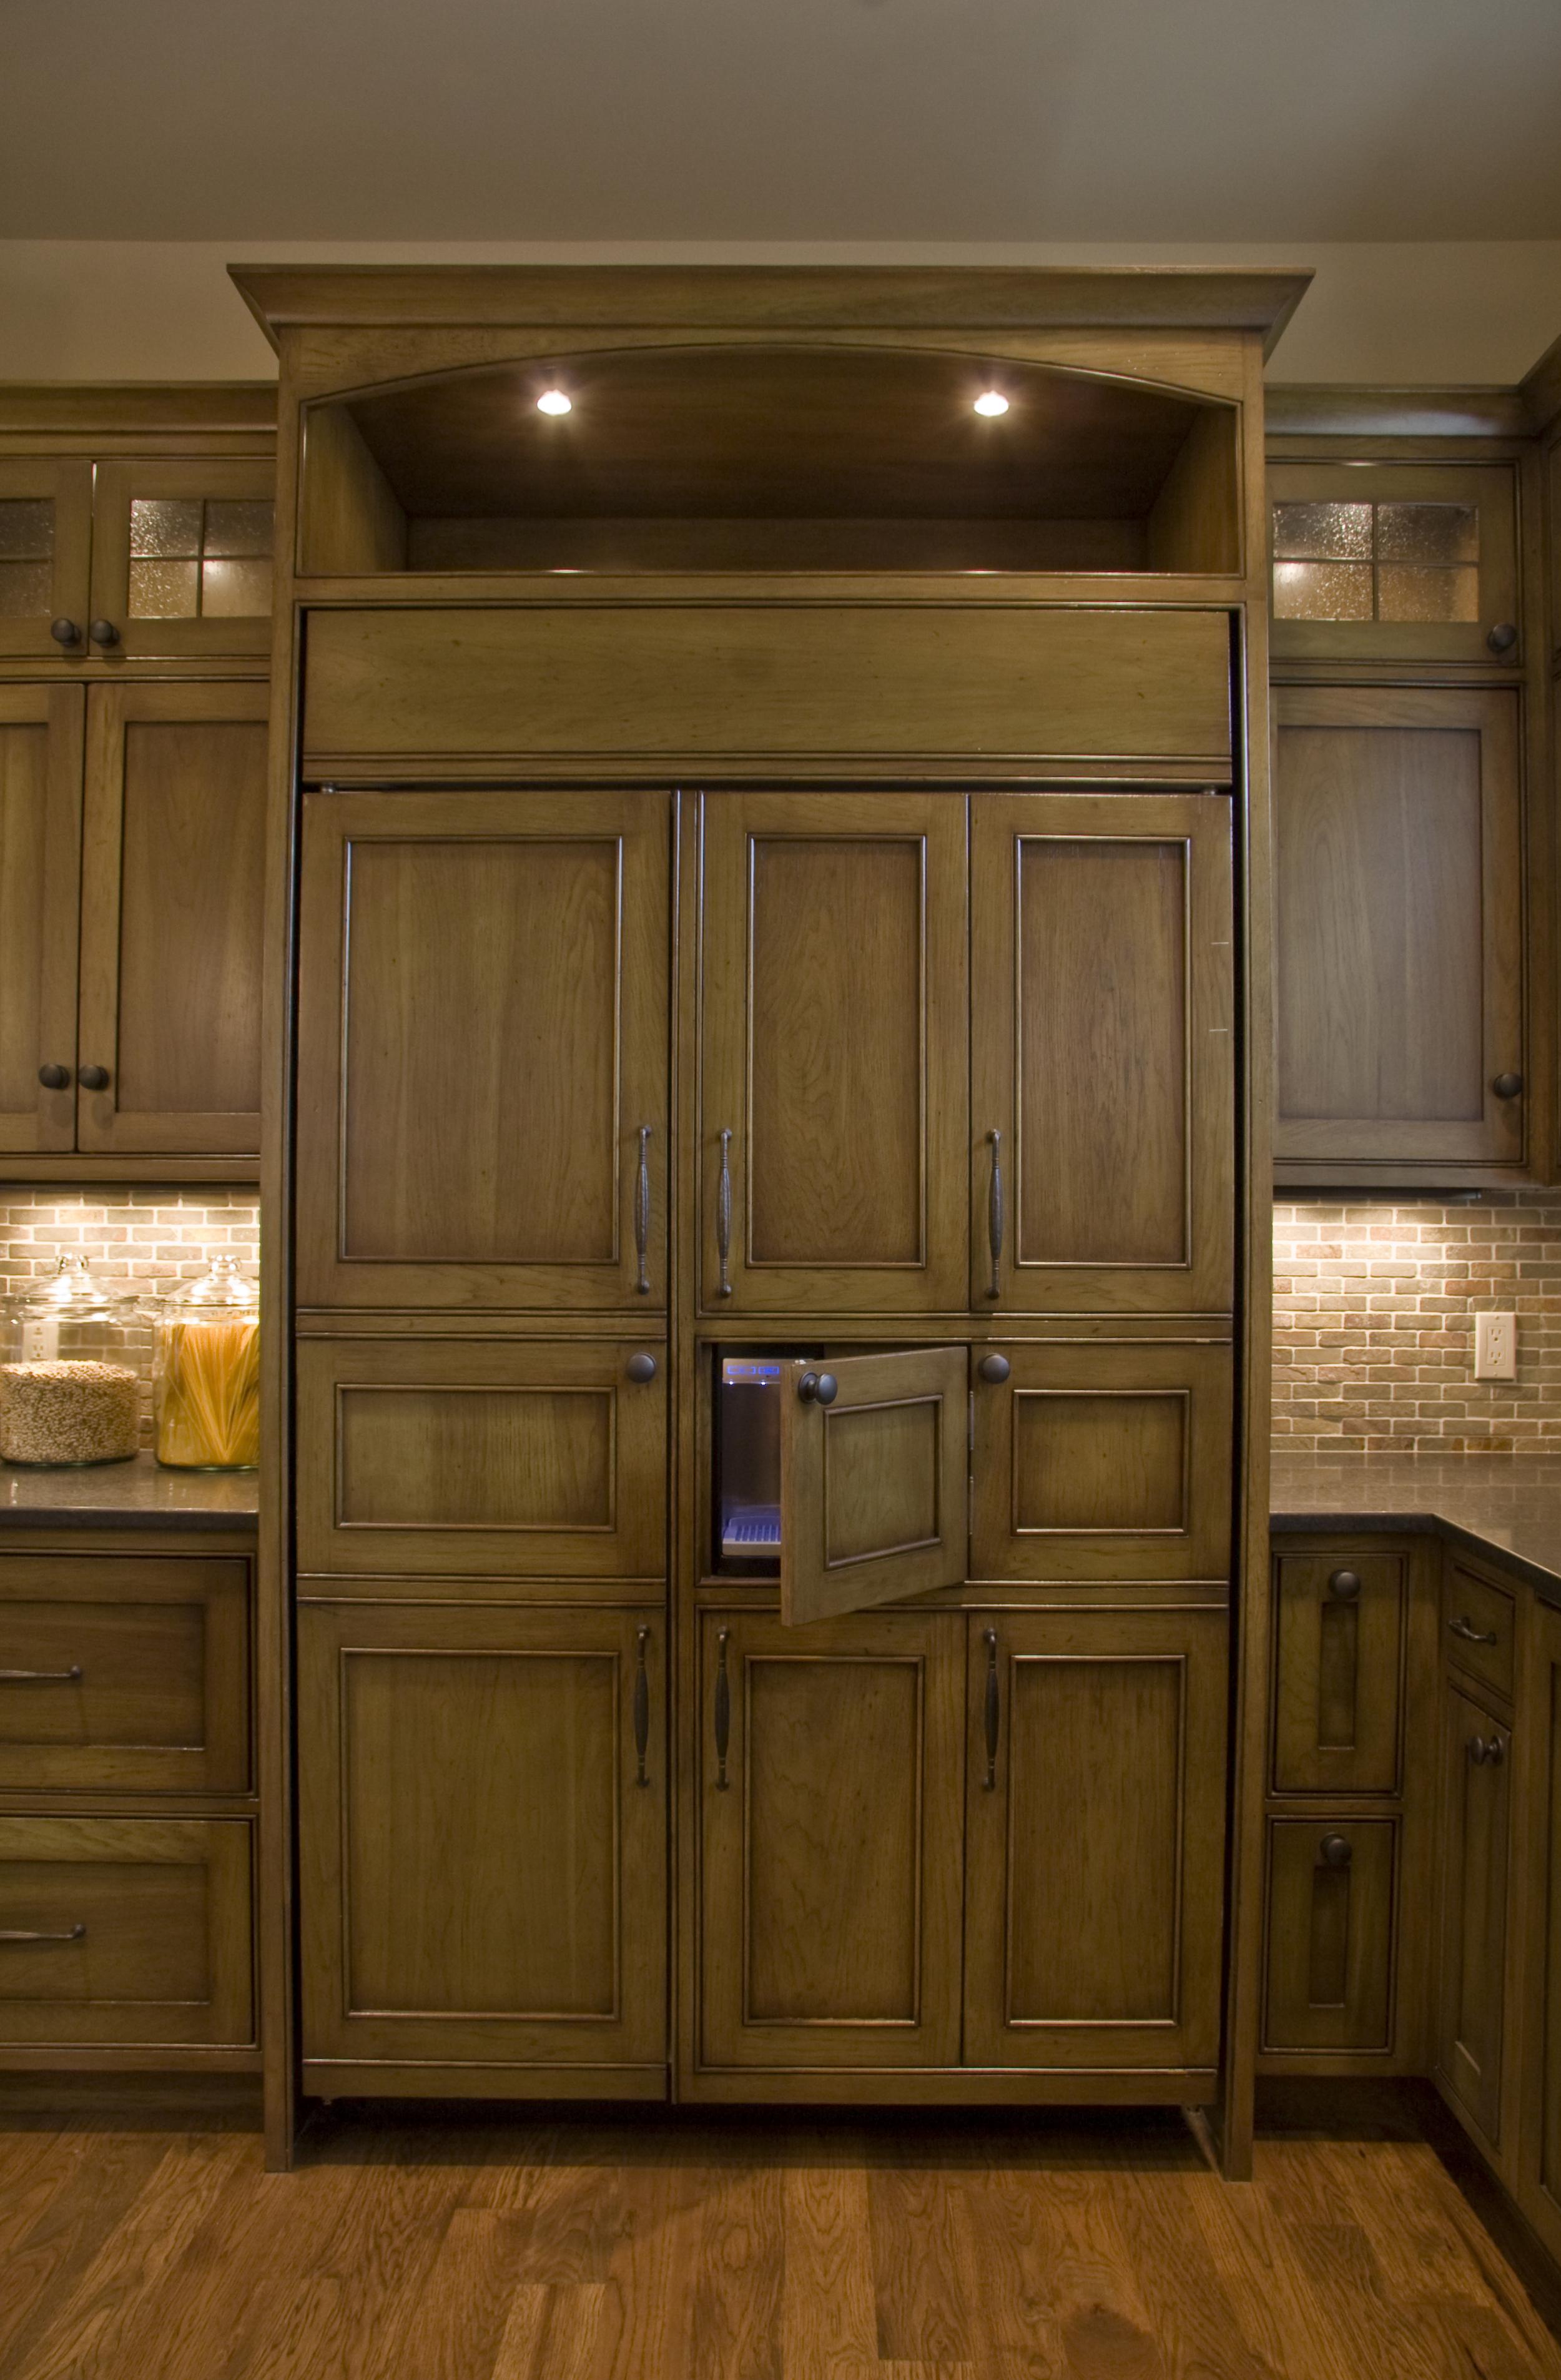 Kitchen fridge - 0649.jpg